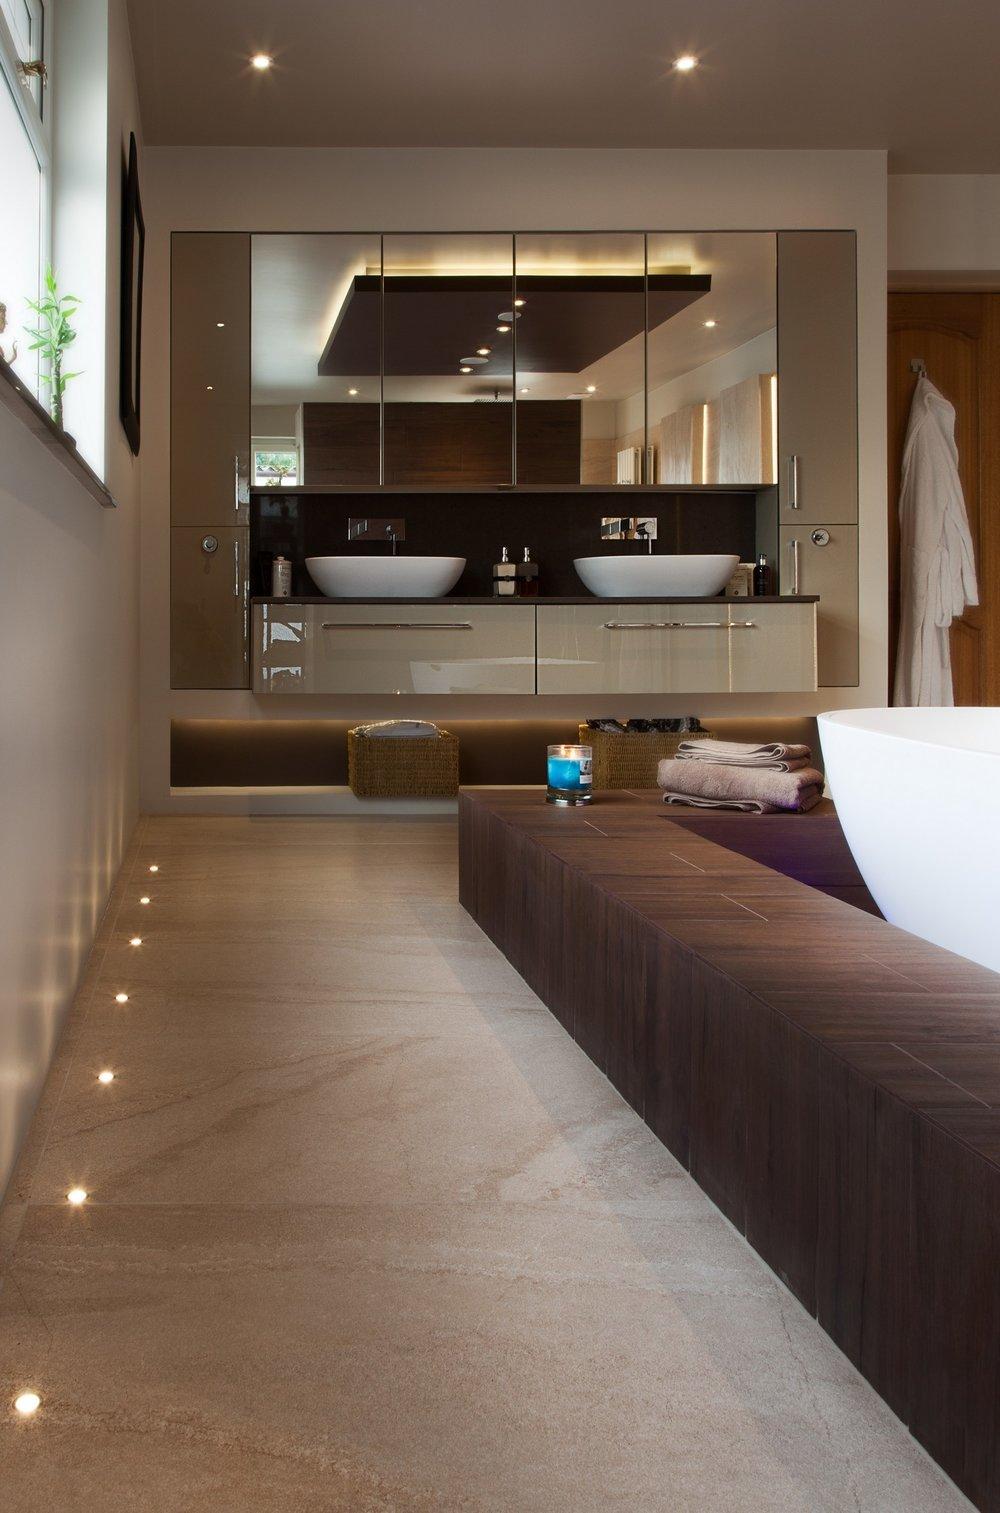 Bagnodesign Bagnodesign Luxury Bathrooms Glasgow Bathroom